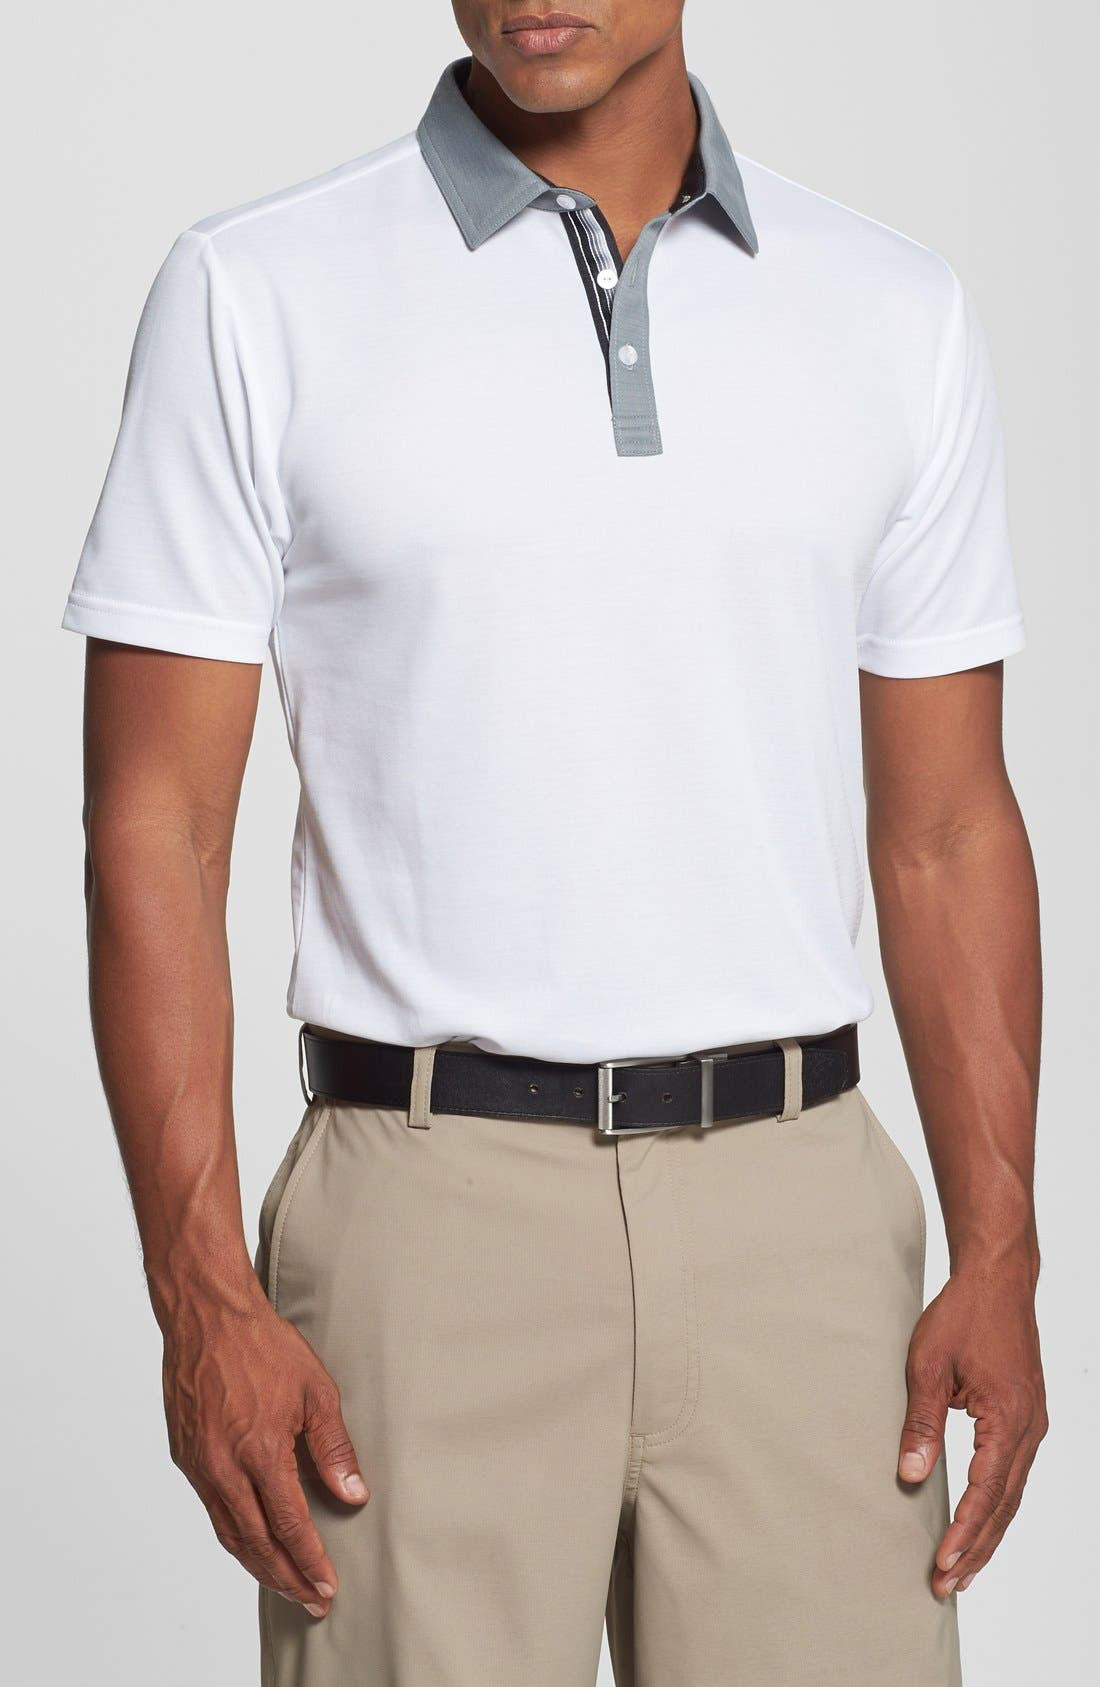 Main Image - Travis Mathew 'Collins' Trim Fit Performance Golf Polo